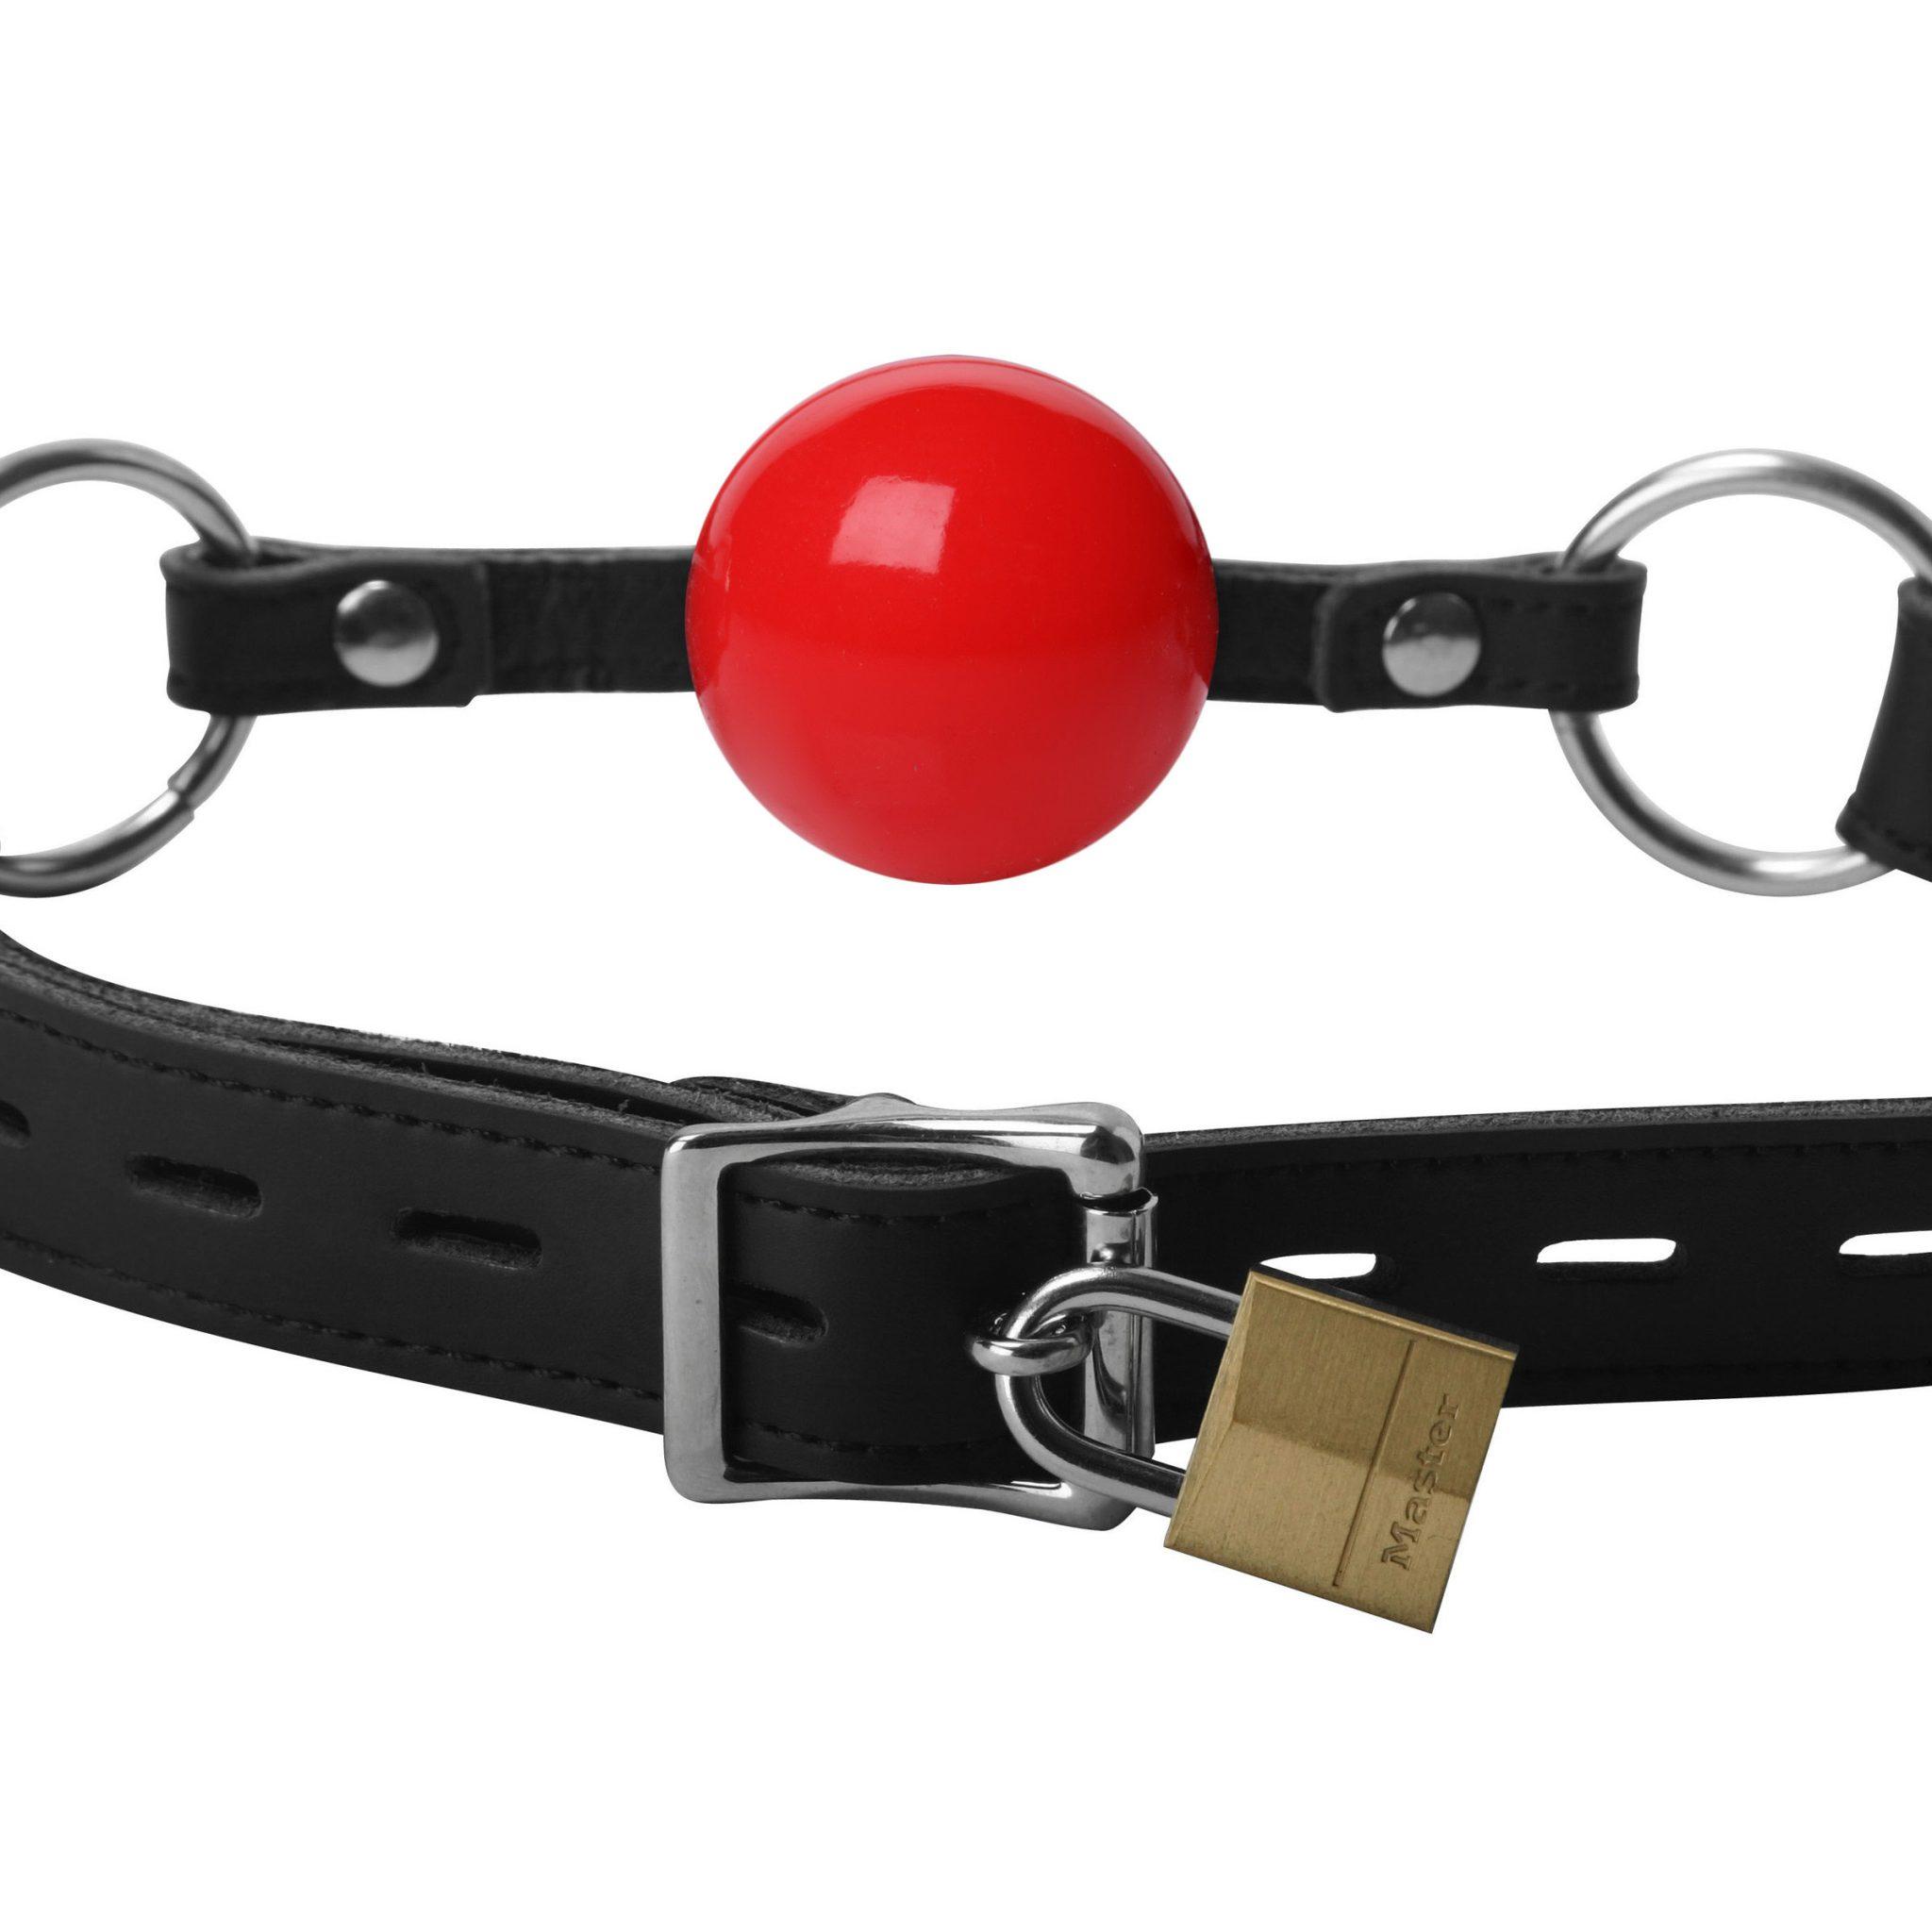 Classic Locking Silicone Ball Gag – Red